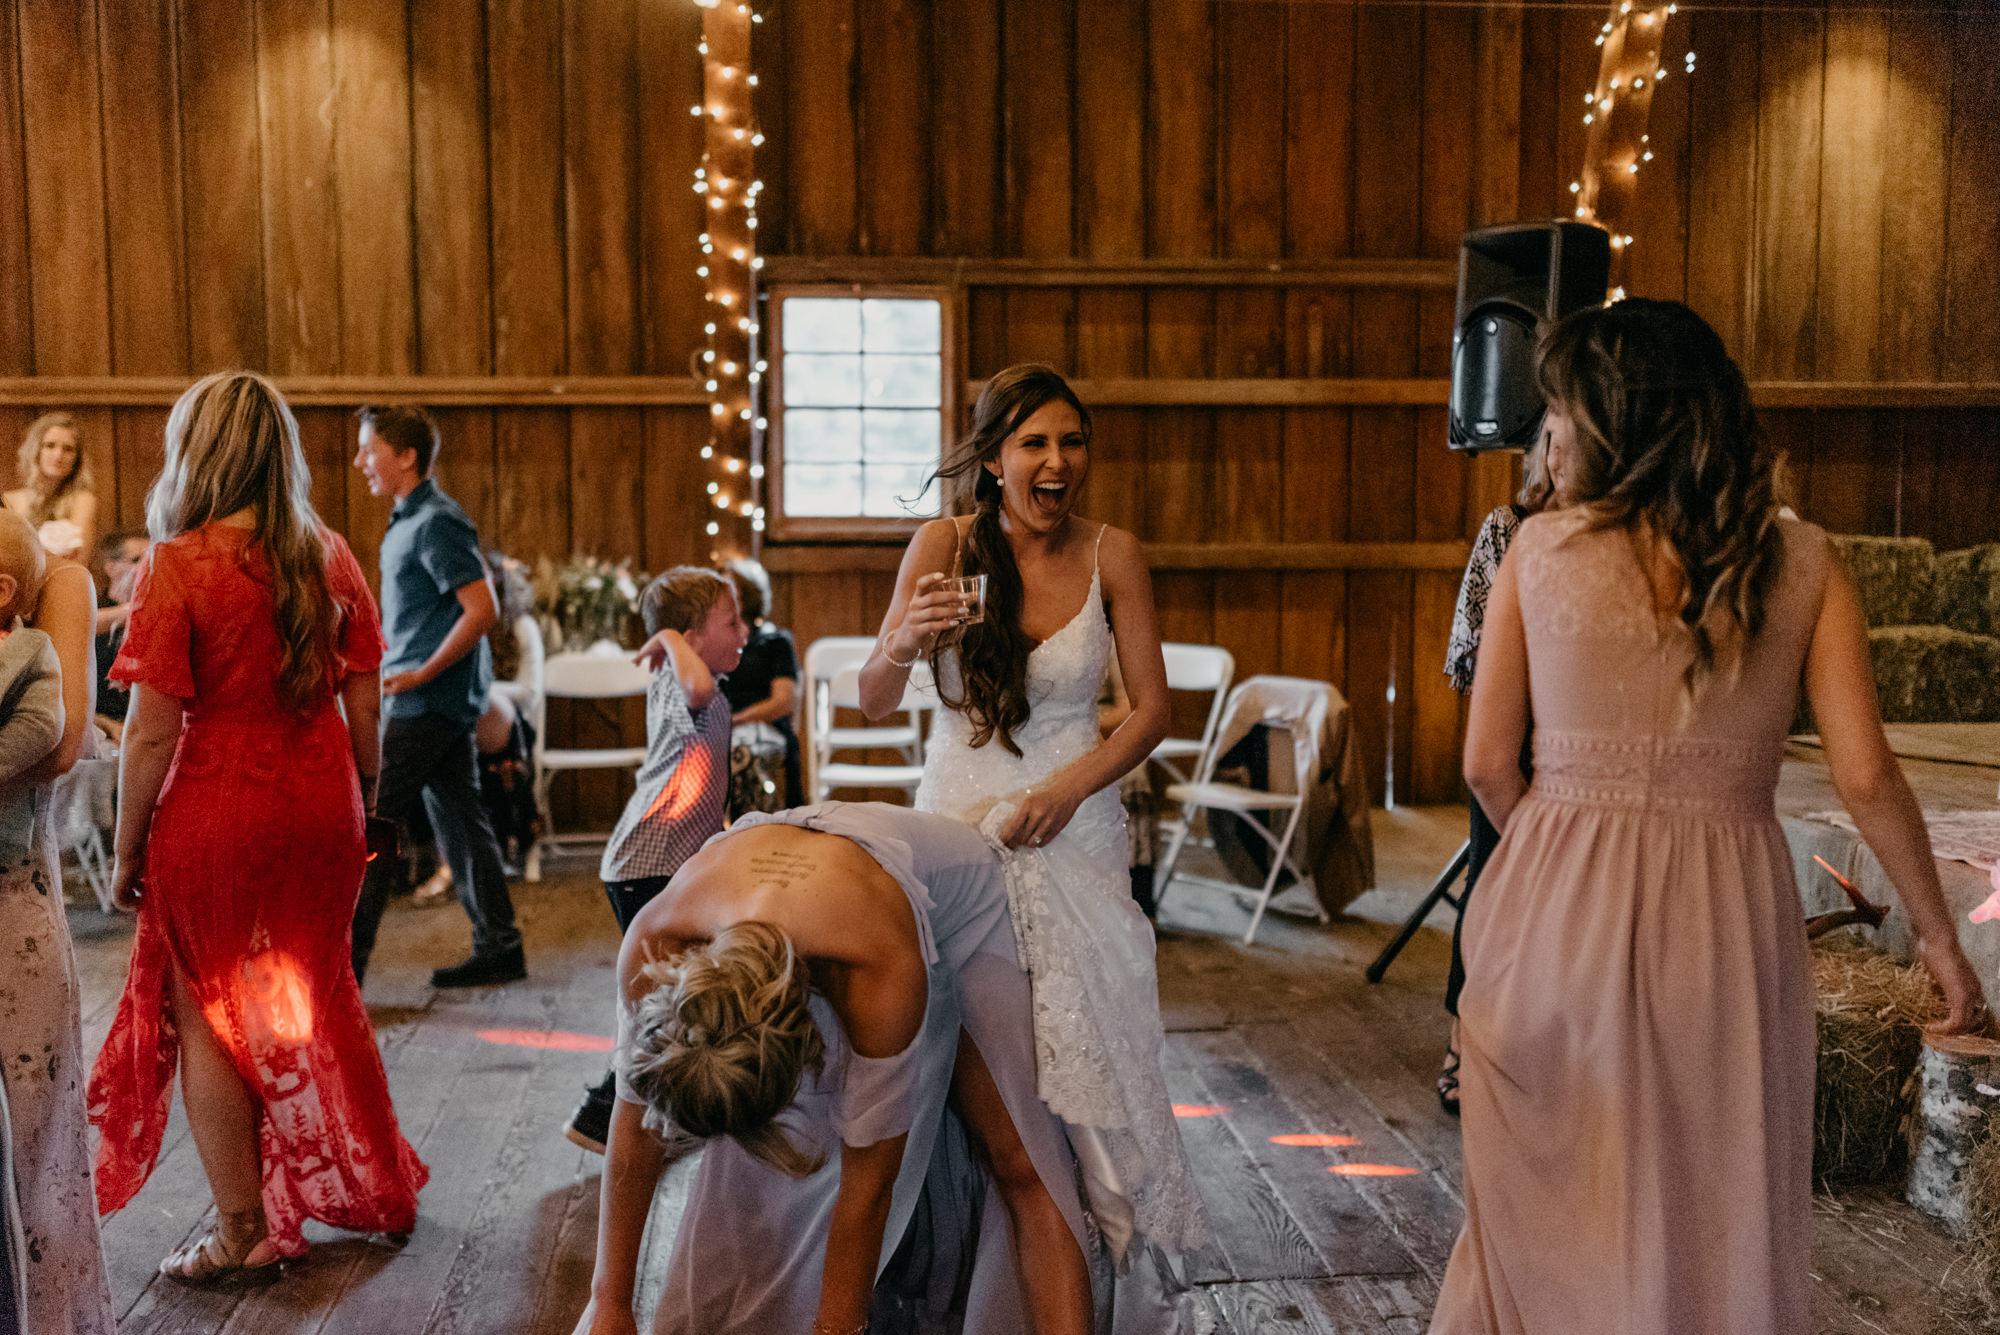 202-portland-northwest-wedding-bubble-exit-barn-string-lights.jpg